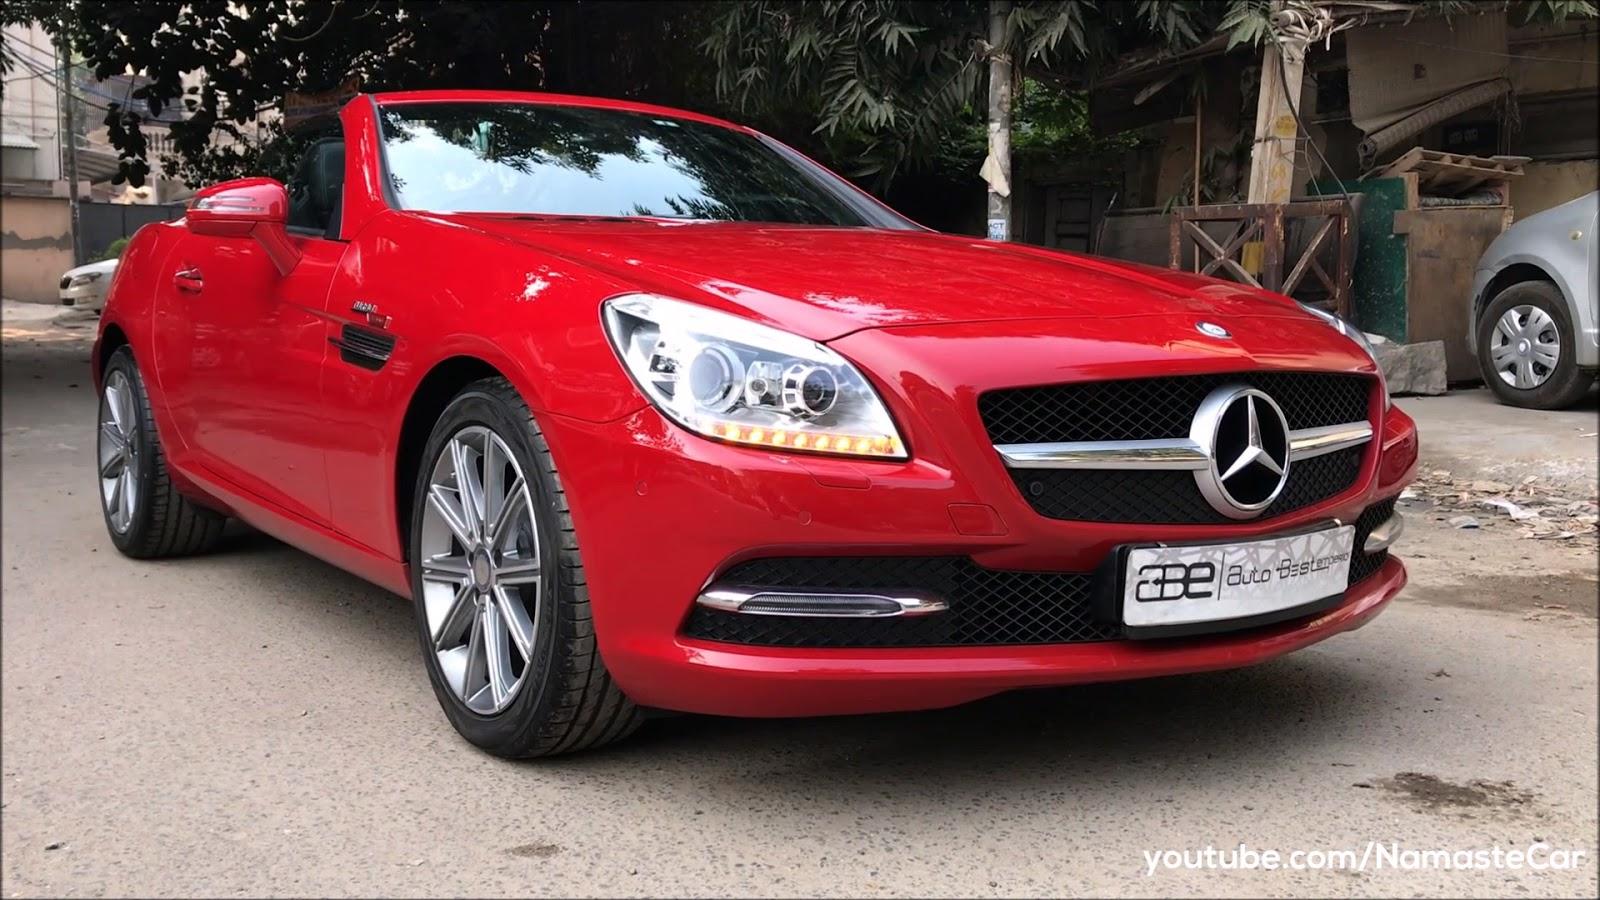 Times Car: Mercedes-Benz SLK 350 BlueEFFICIENCY hindi review by Namaste Car